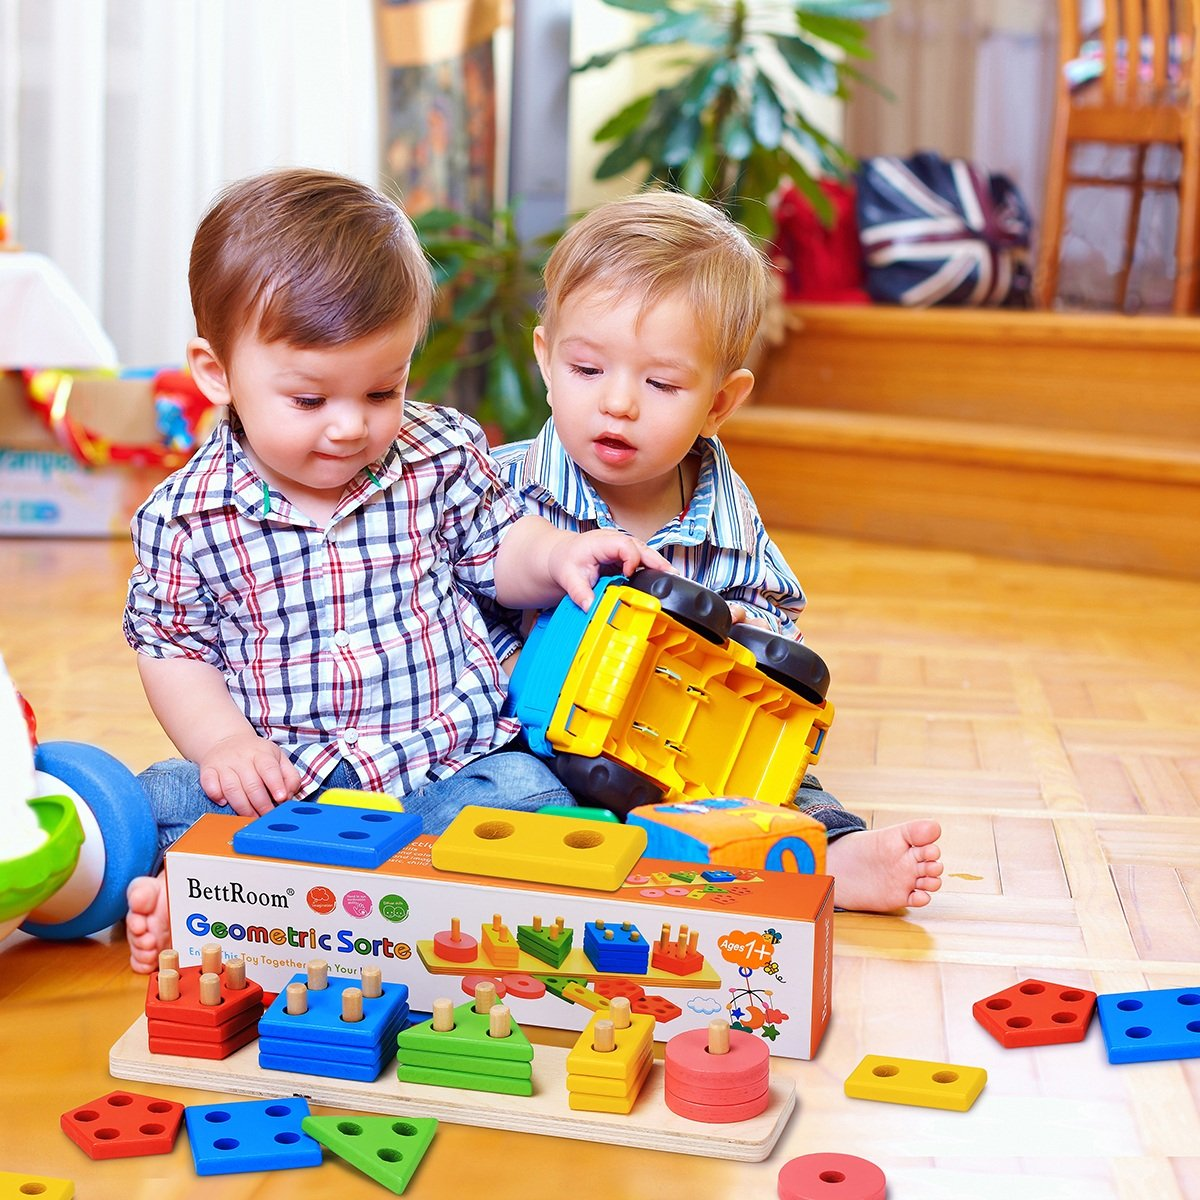 BettRoom Wooden Educational Preschool Toddler Toys for 1 2 ...